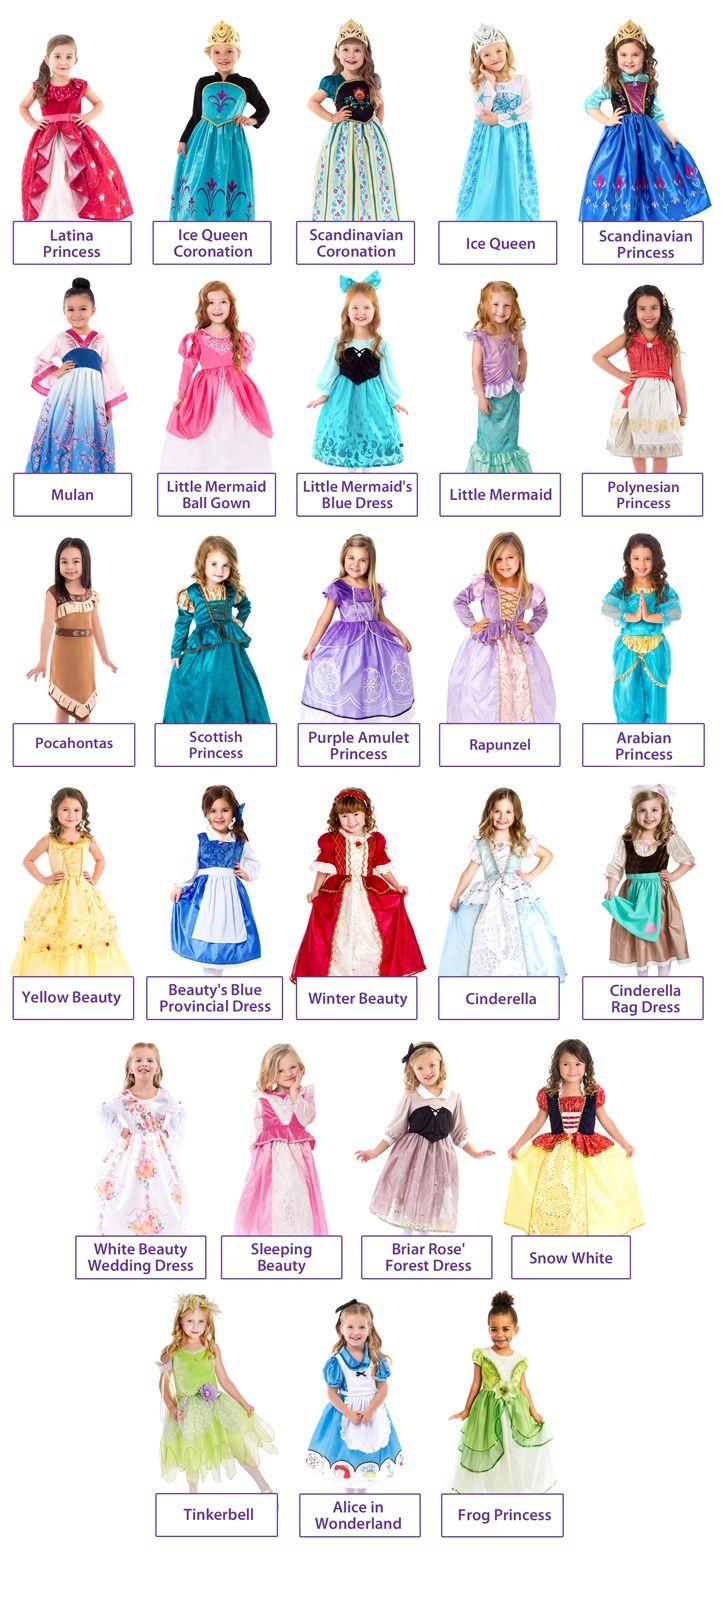 Disney Princesses Replica Ballgown Dress Up Set Disney Princess Dress Up Disney Princess Outfits Little Girl Princess Dresses